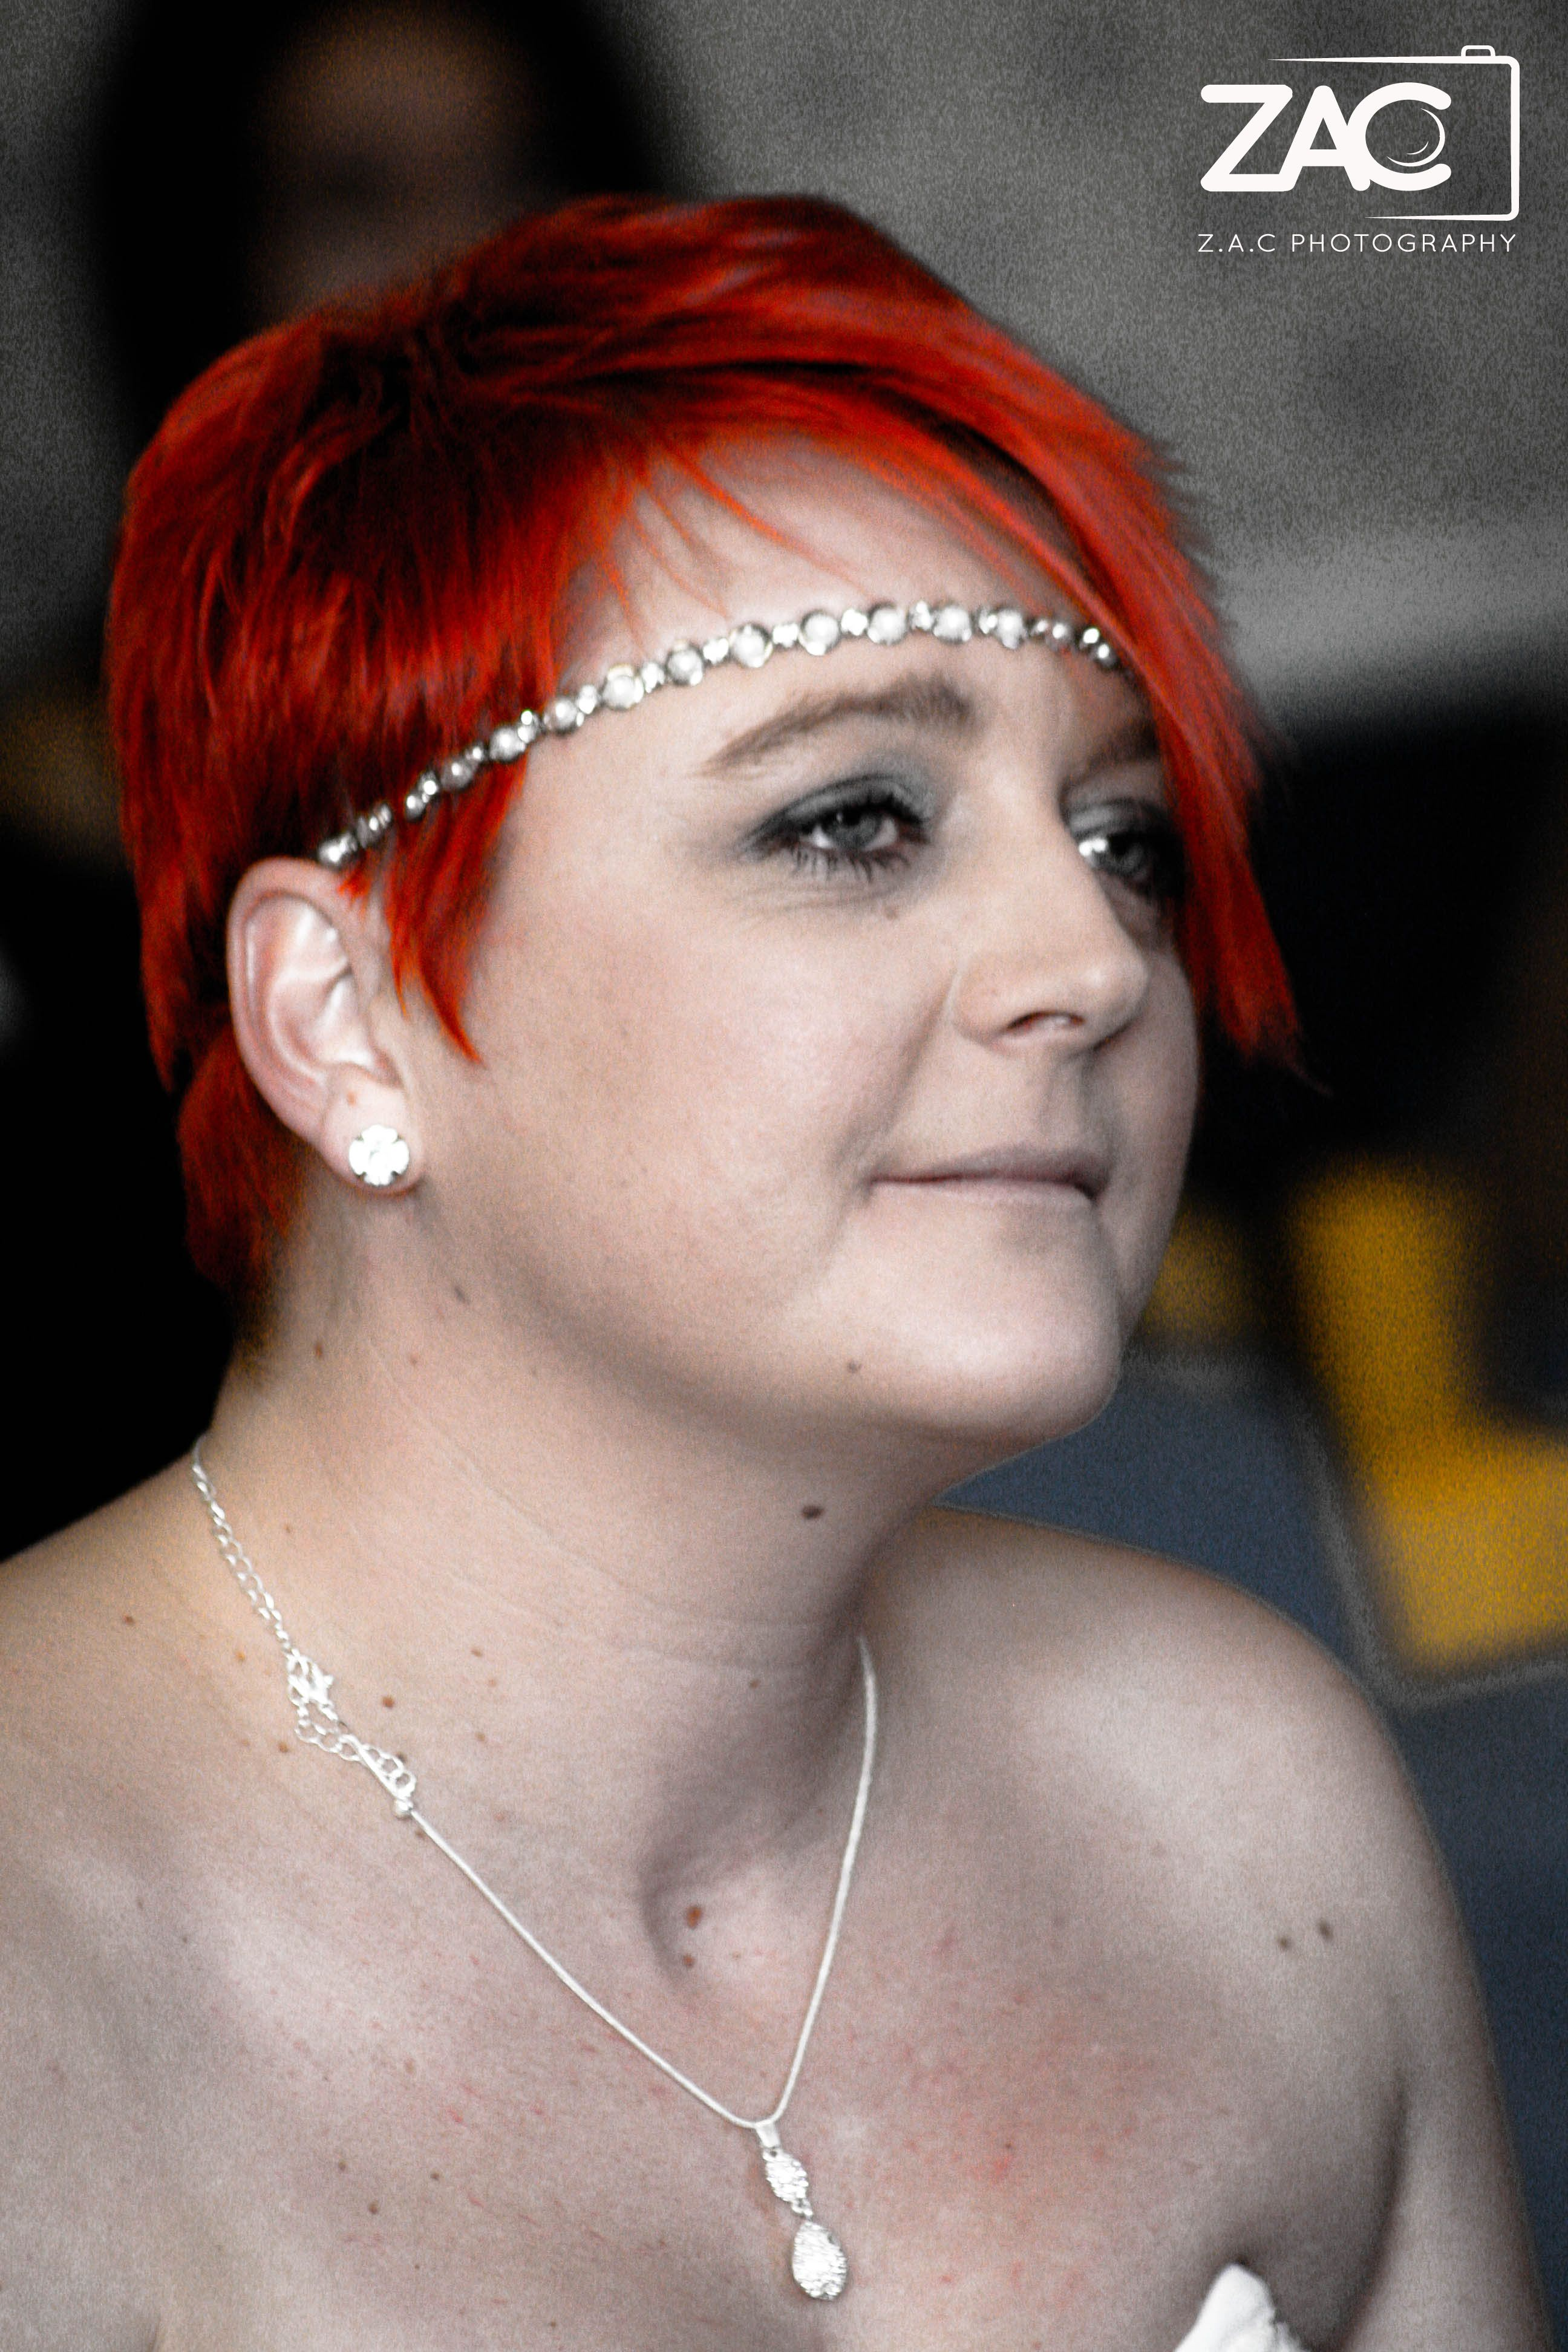 ZAC Photography UK Female Photographer Bracknell, Berkshire UK zaclarke.wix.com/...